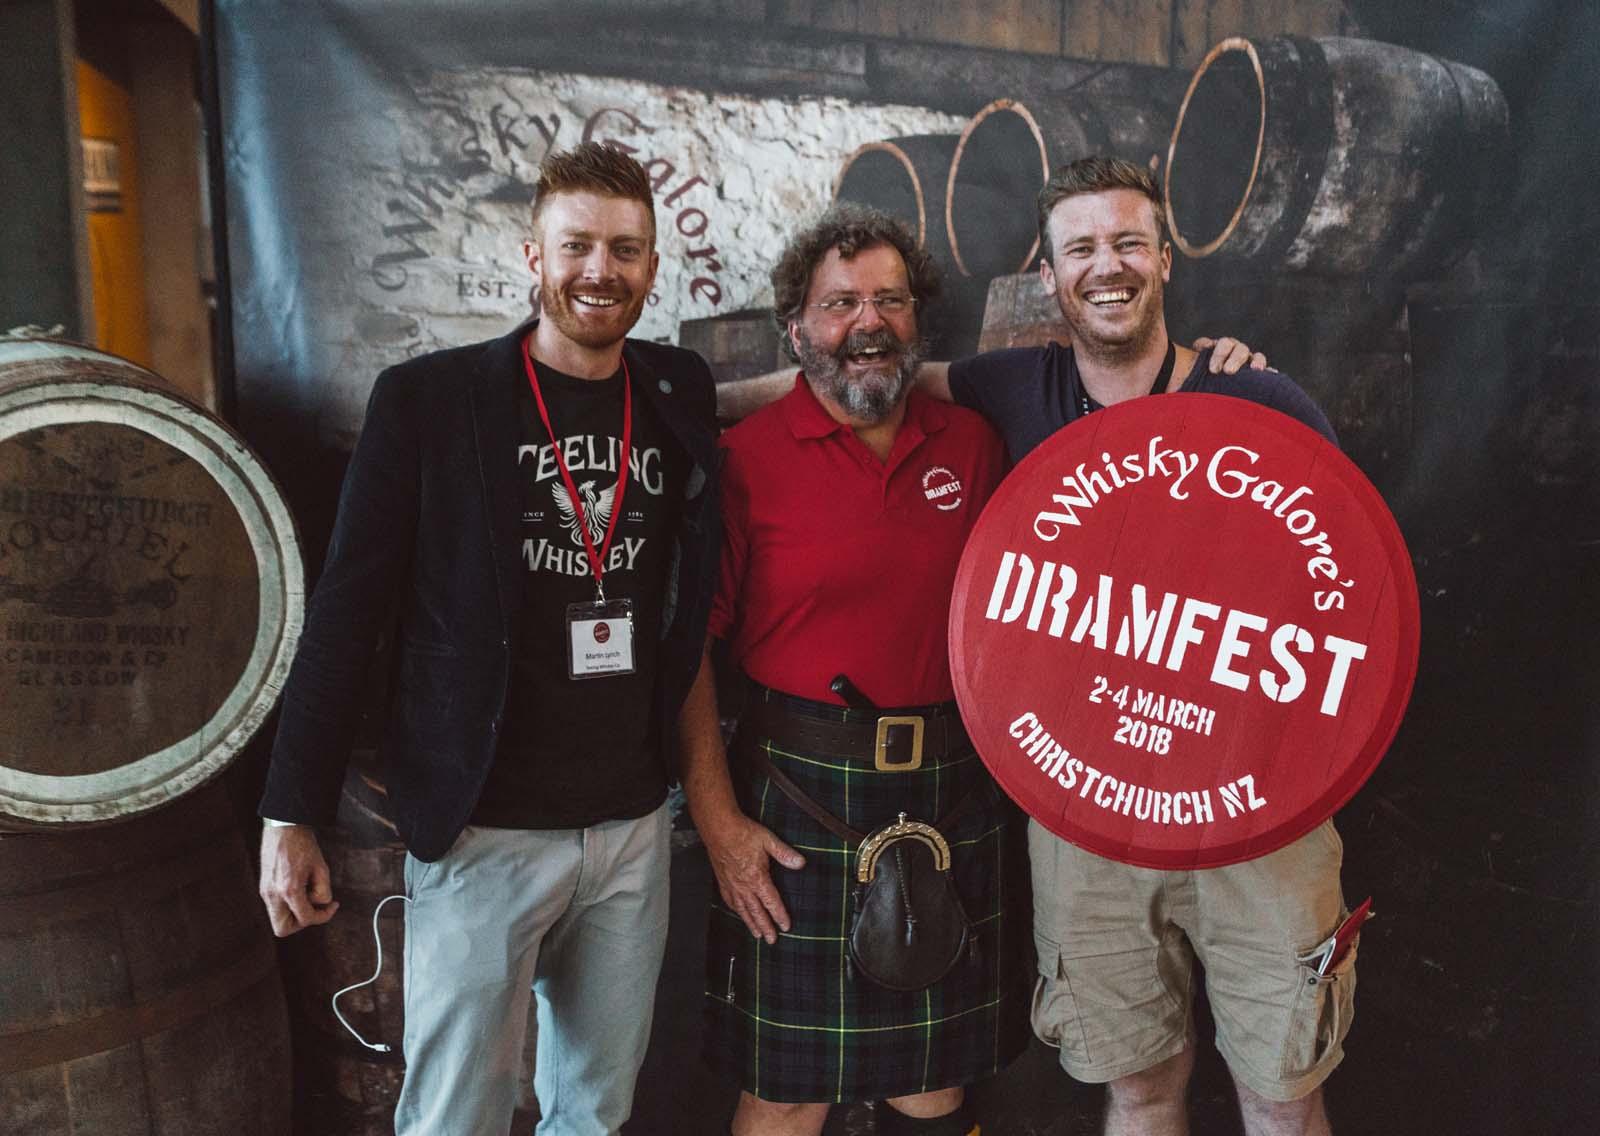 Dramfest 2018 for Whisky Galore-103.jpg